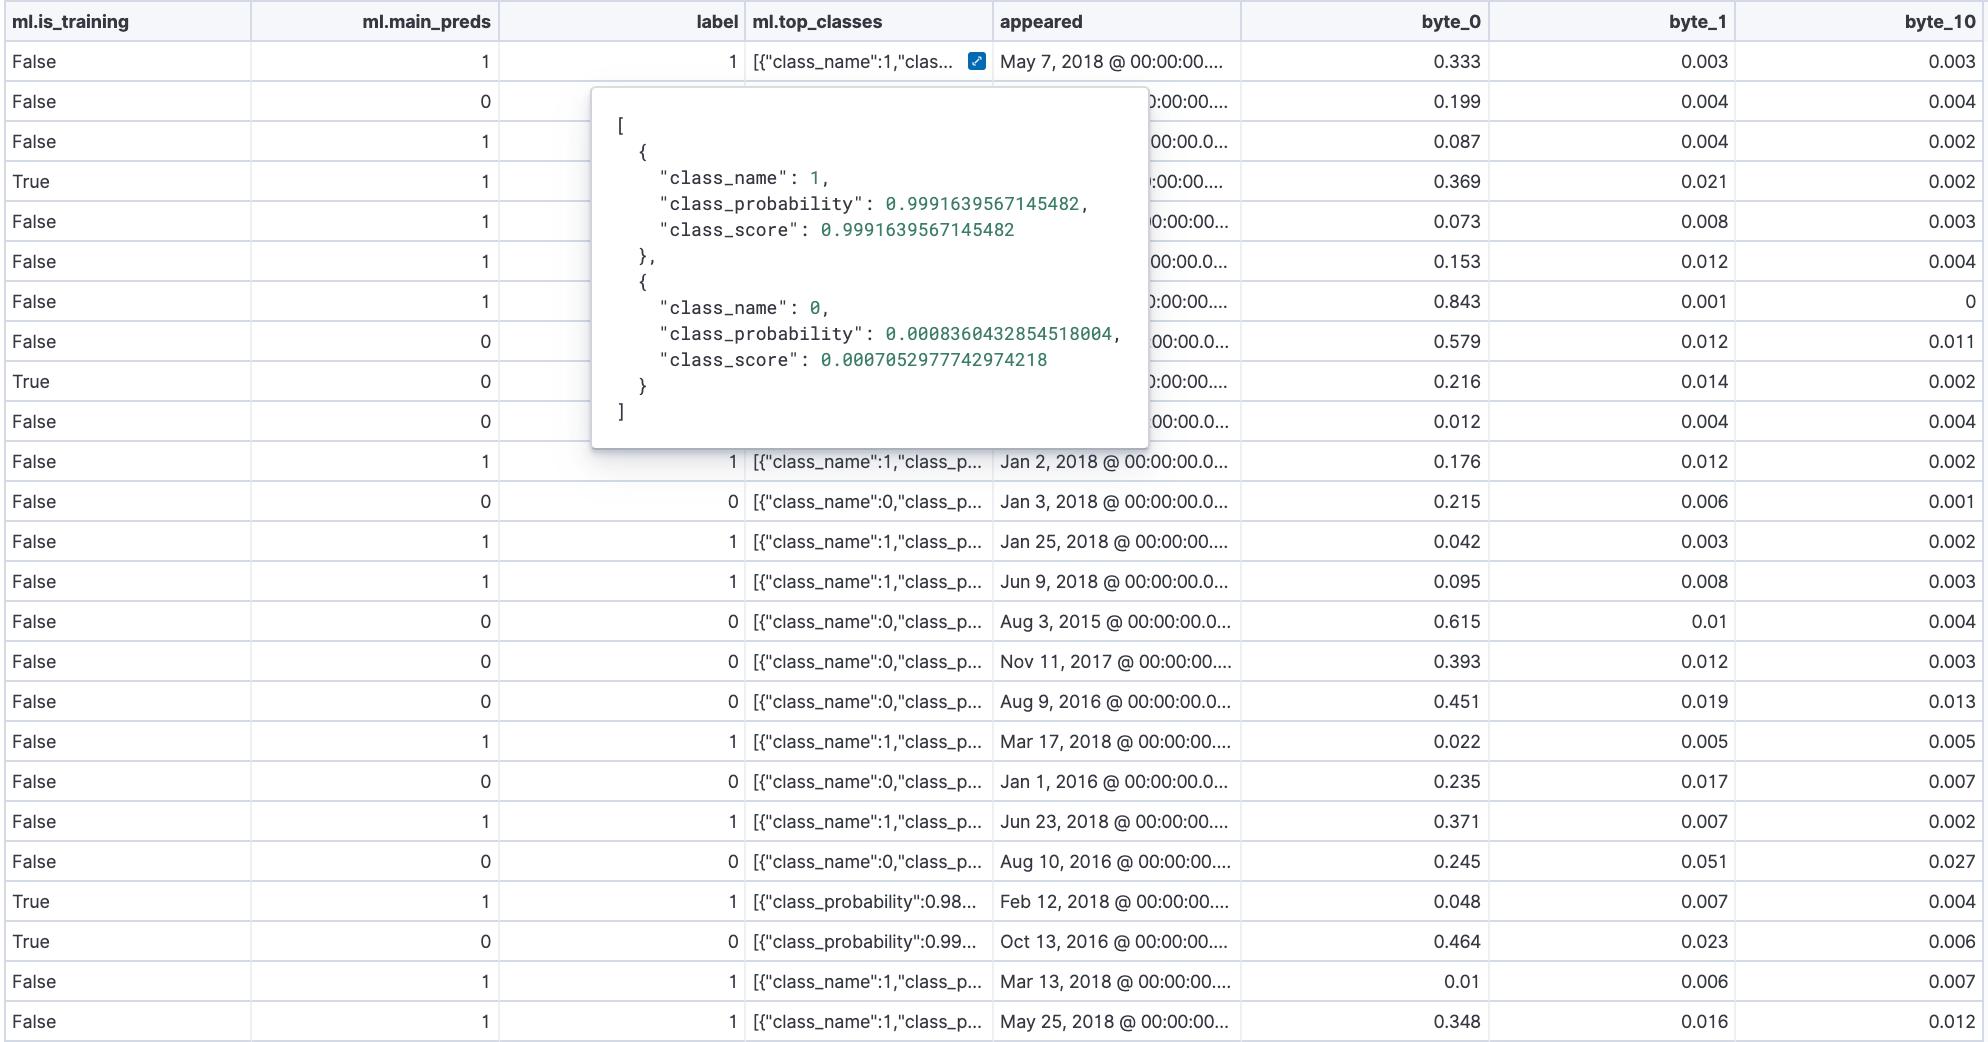 main_preds 대상 인덱스의 데이터 프레임 보기